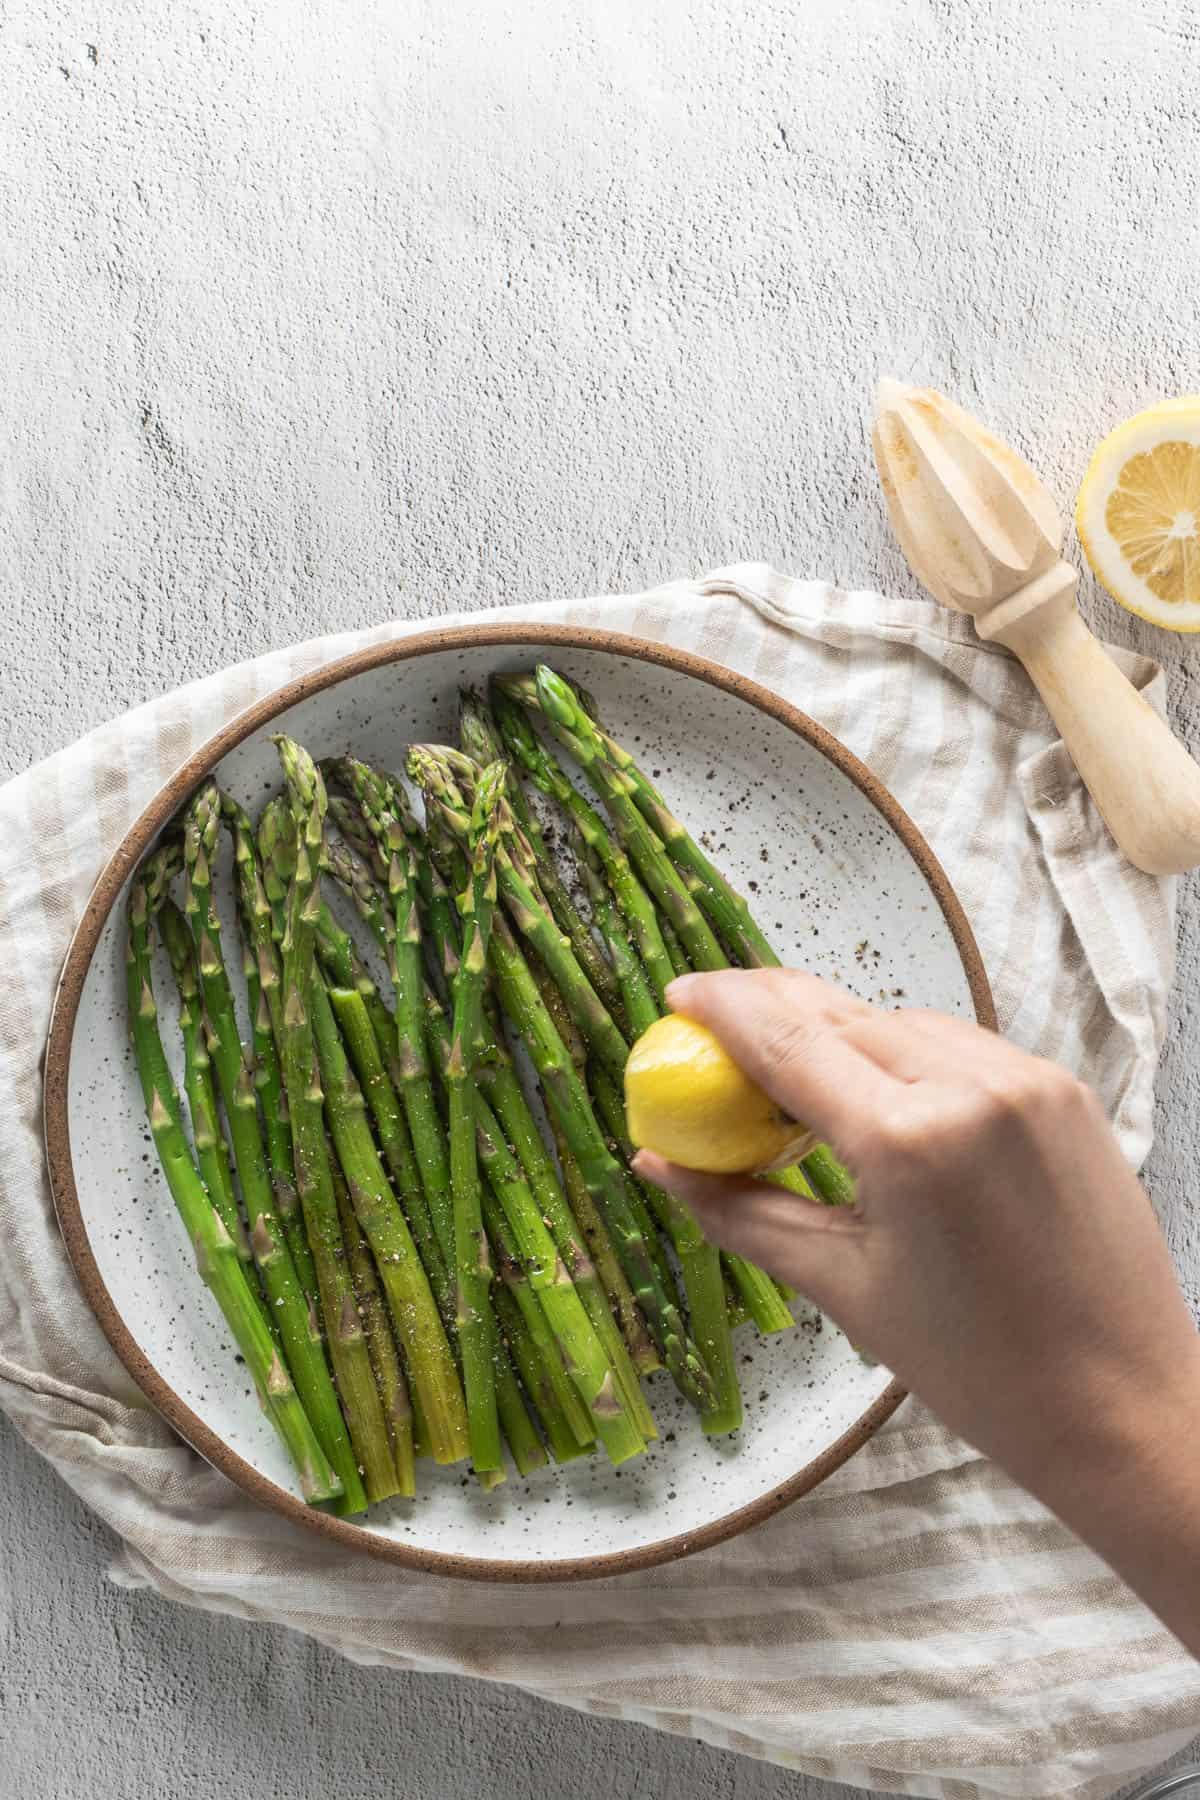 Hand squeezing lemon juice on microwaved asparagus on plate